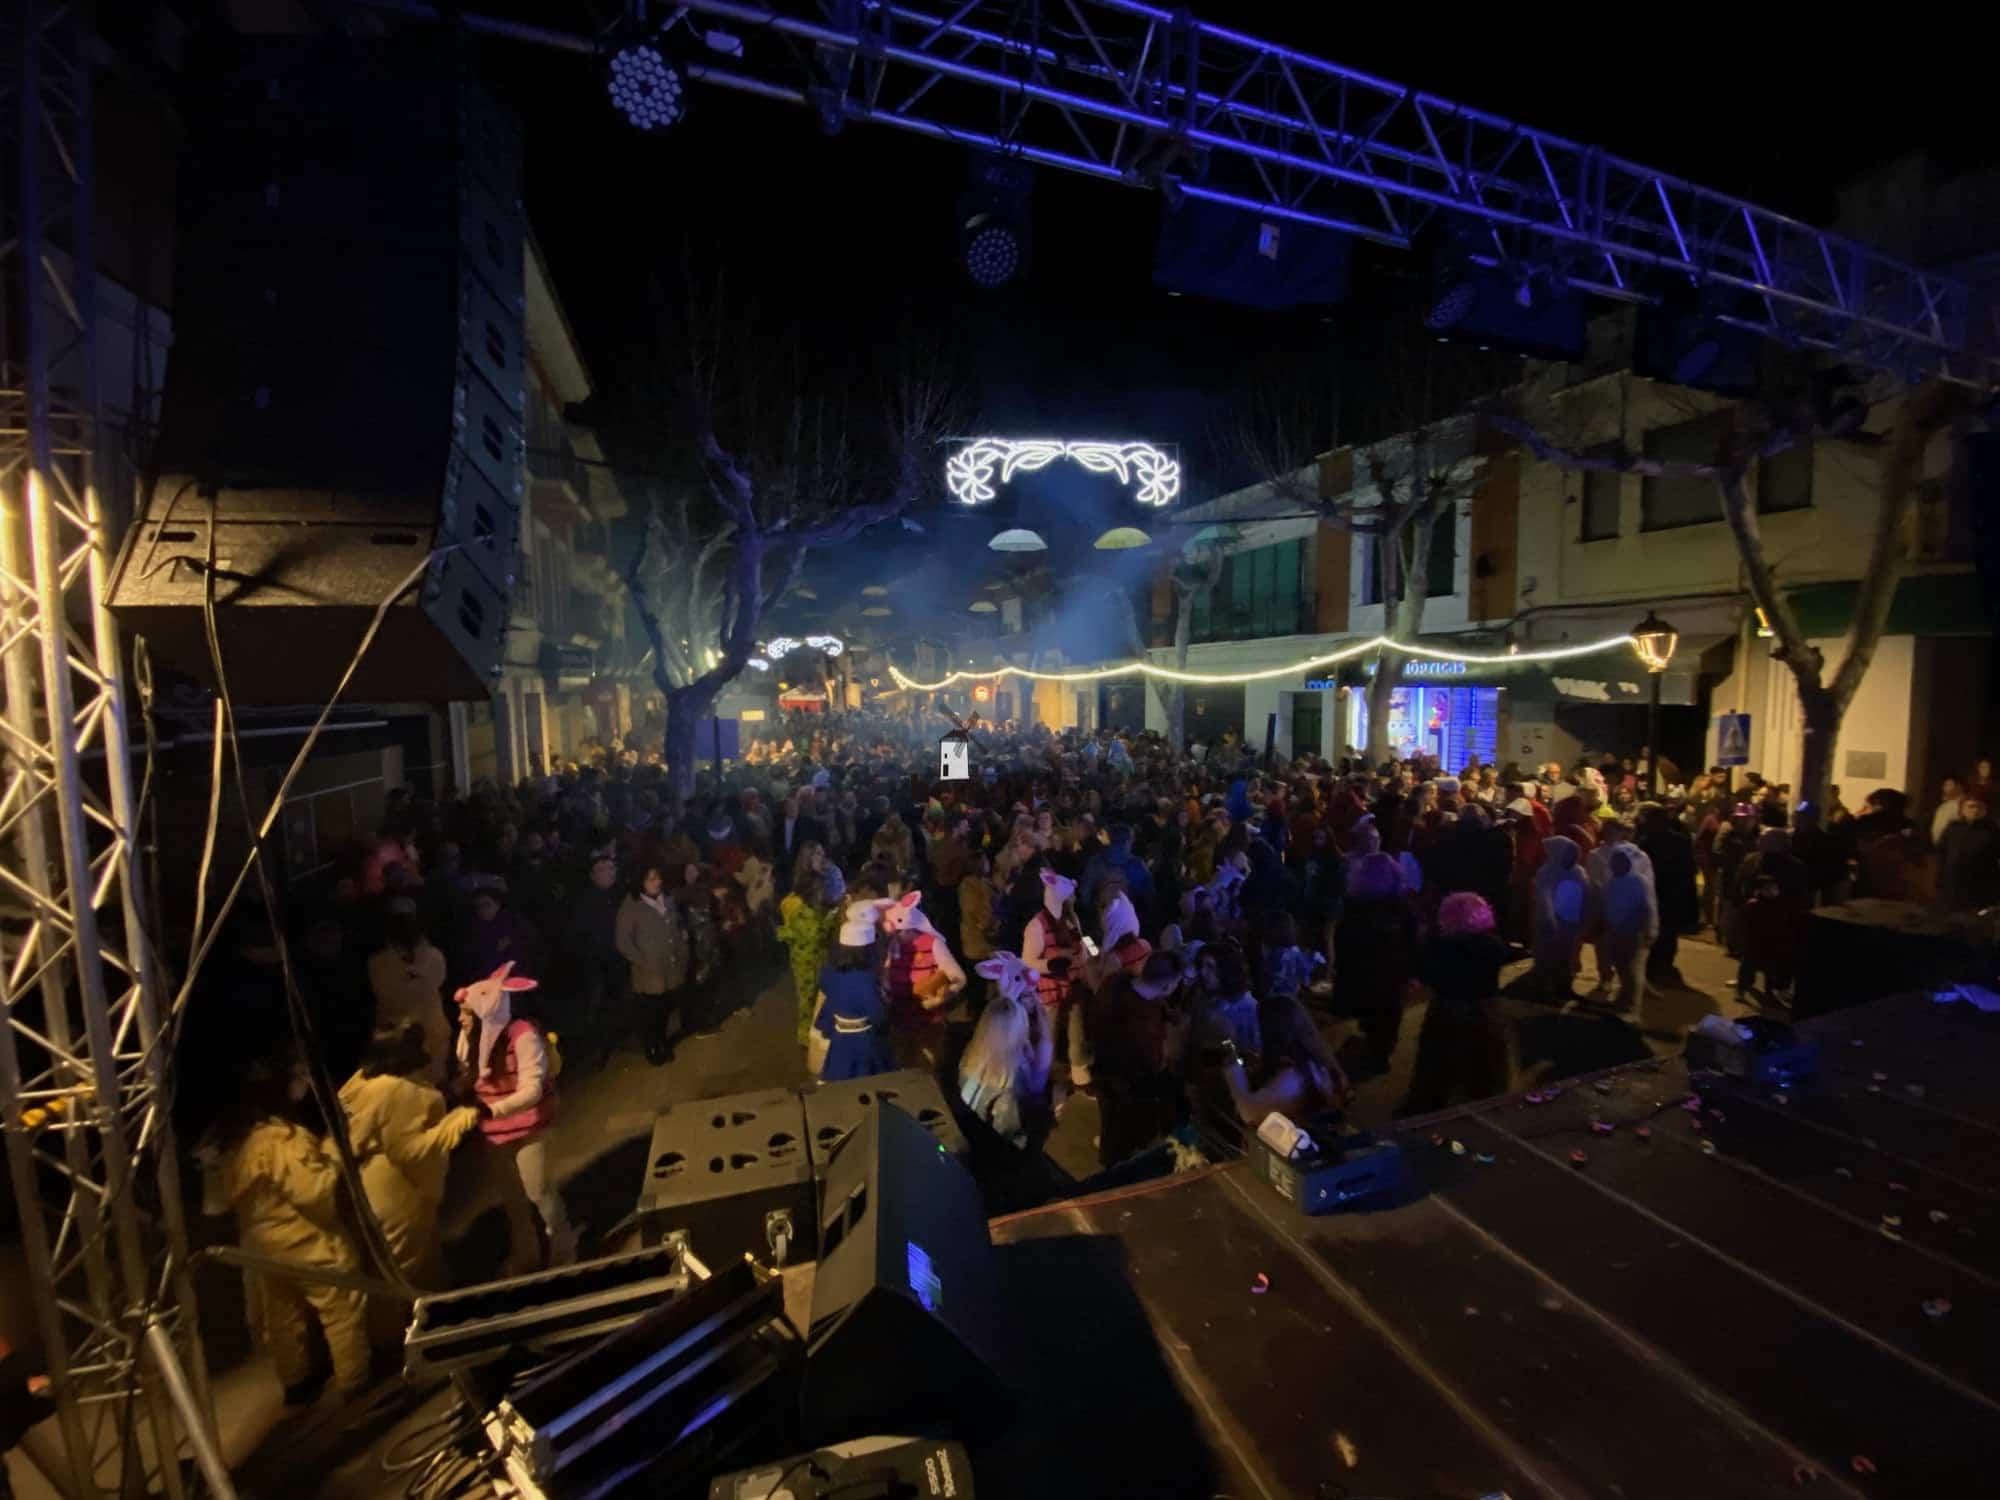 Carnaval de herencia 2019 sabados ansiosos 9 - Inaugurado el Carnaval de Herencia 2020 con el Sábado de los Ansiosos